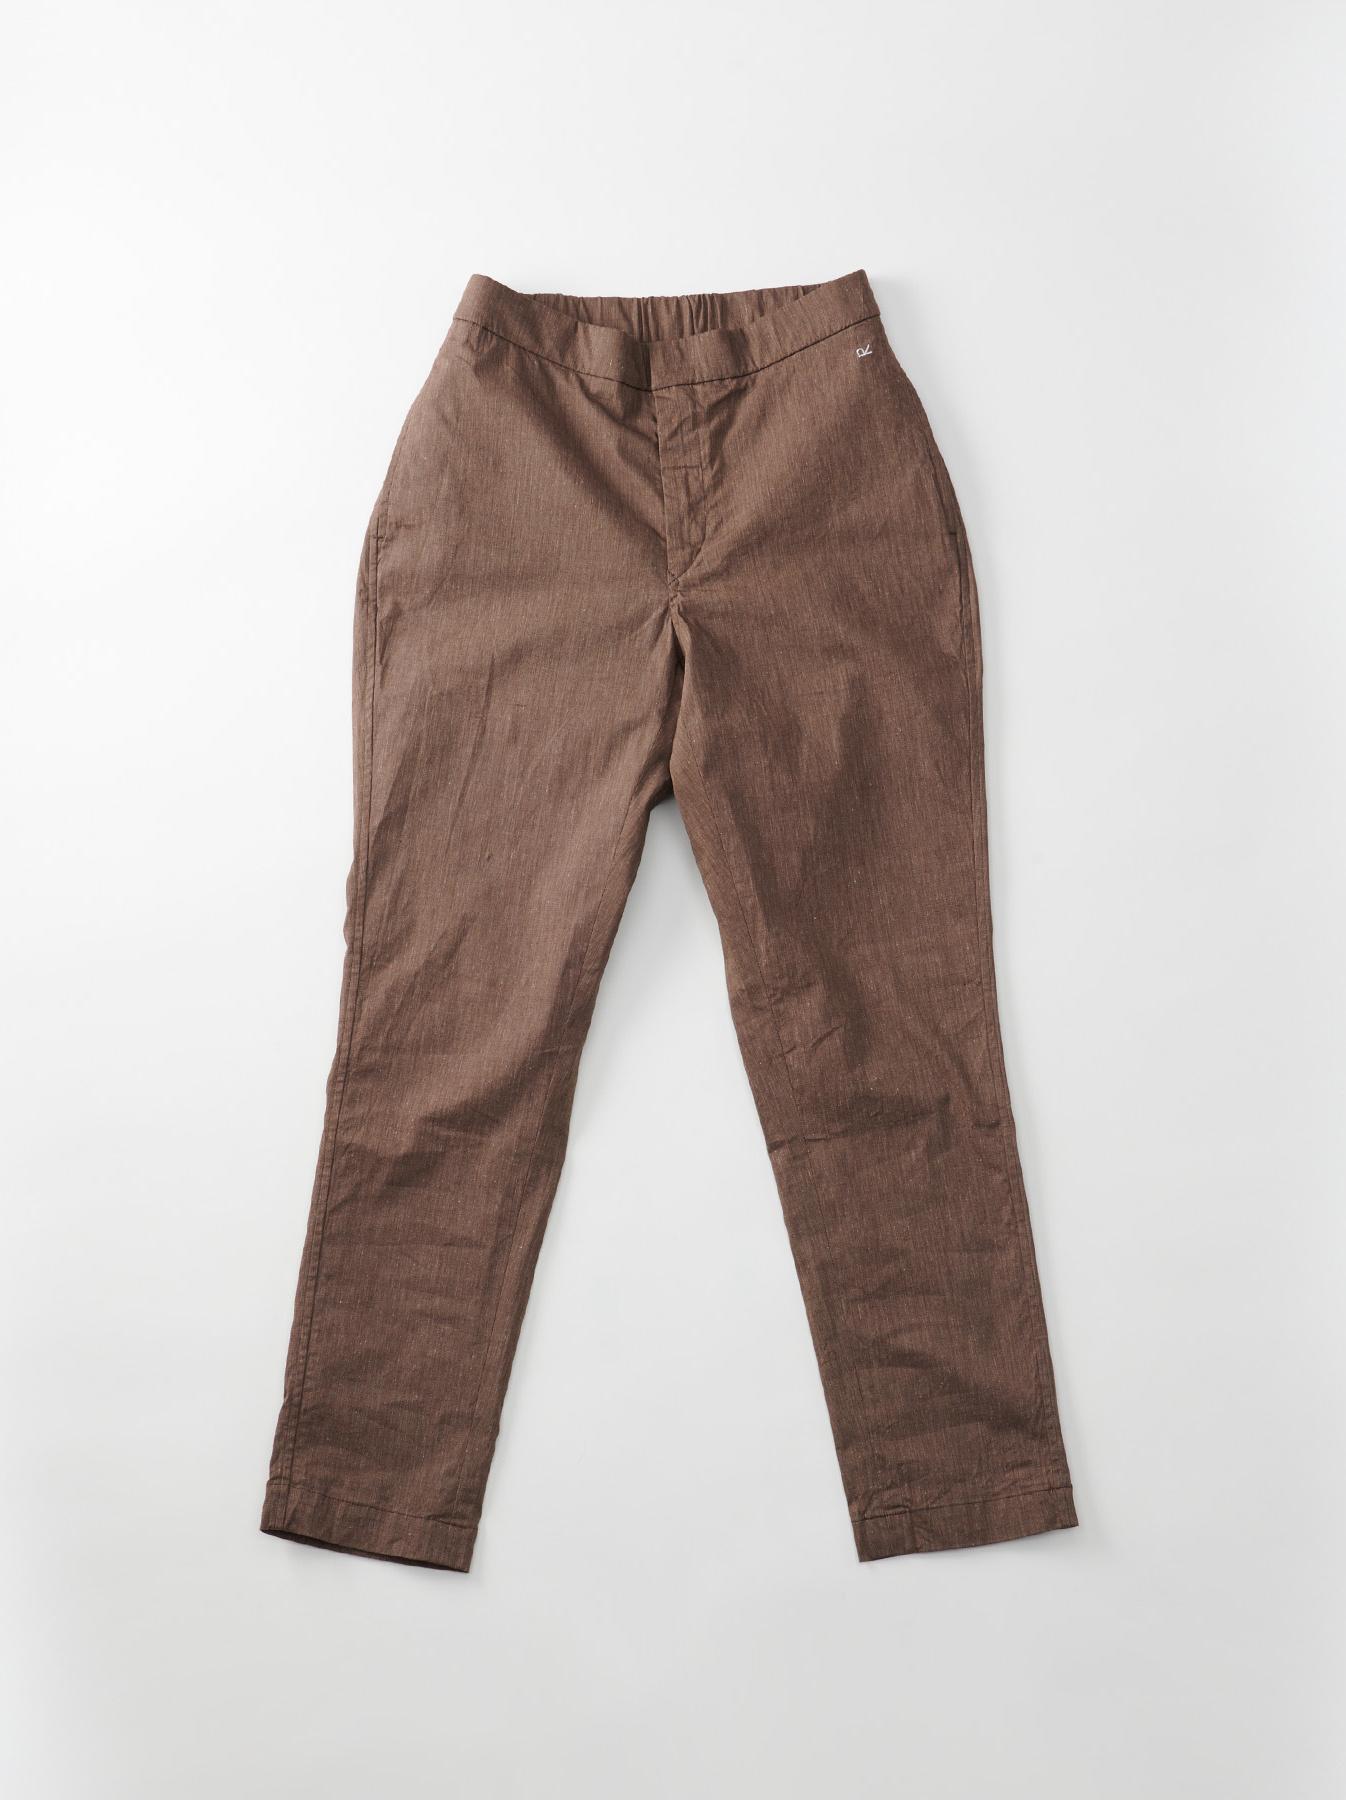 WH Cotton Linen Hakeme Stretch Pants-6